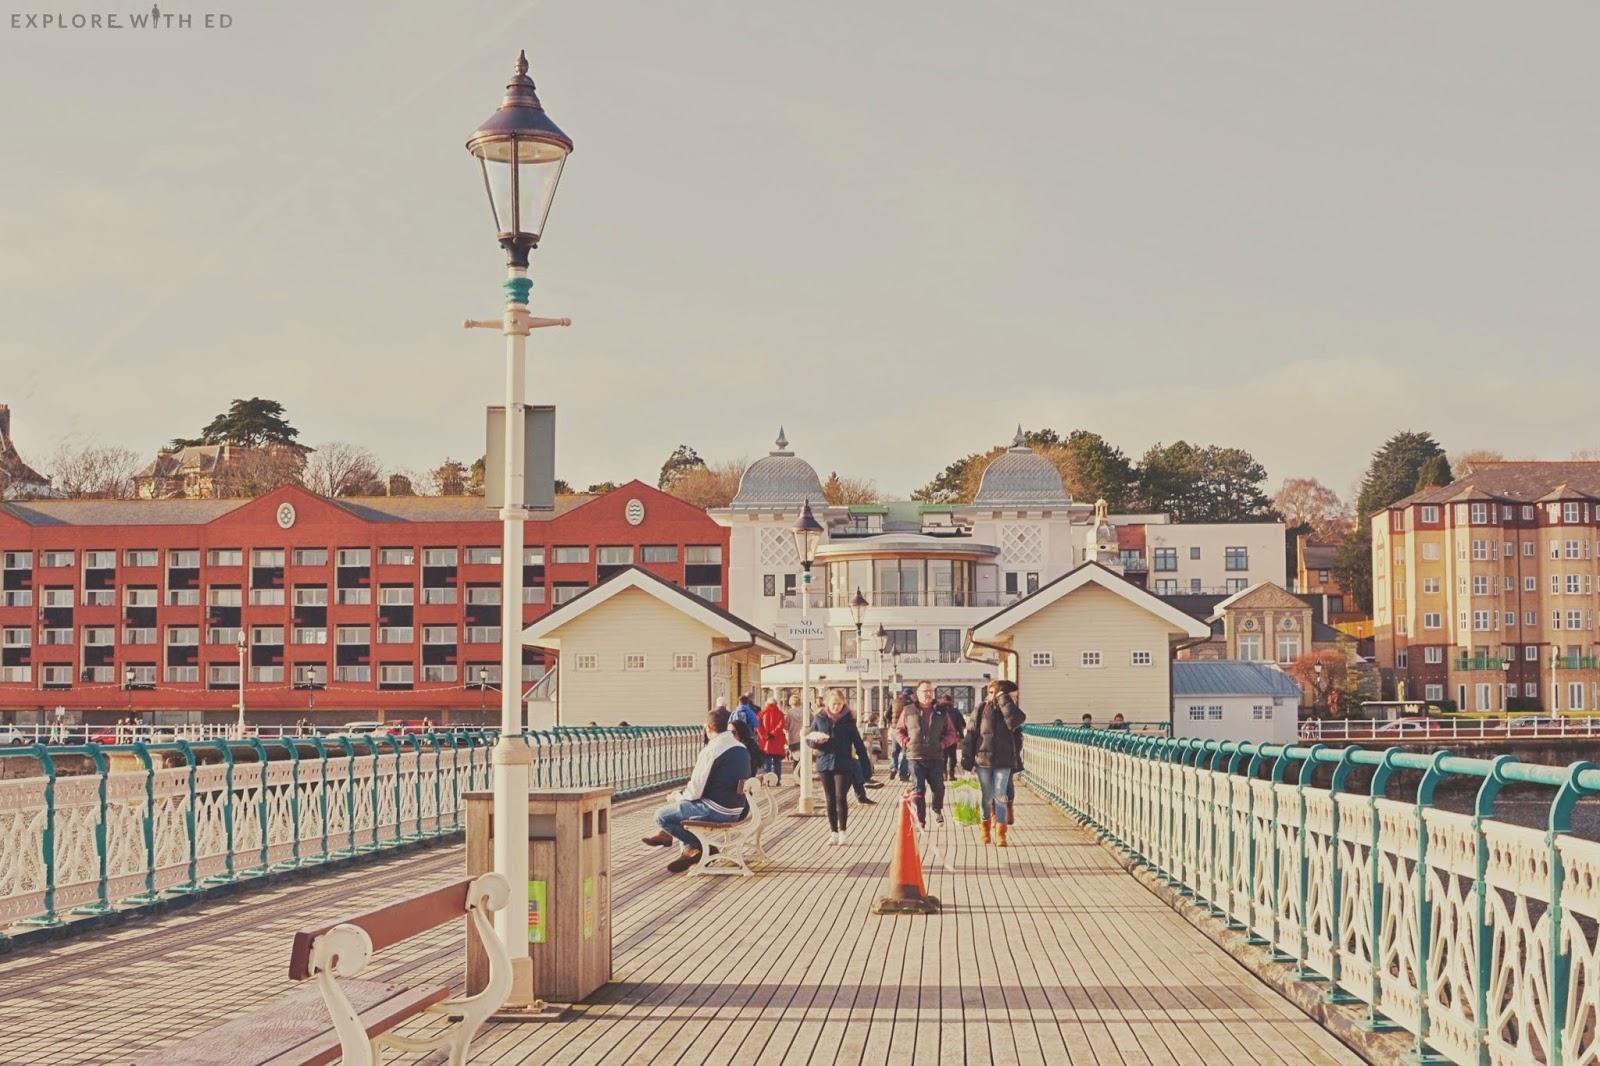 A bright and sunny day on Penarth Pier